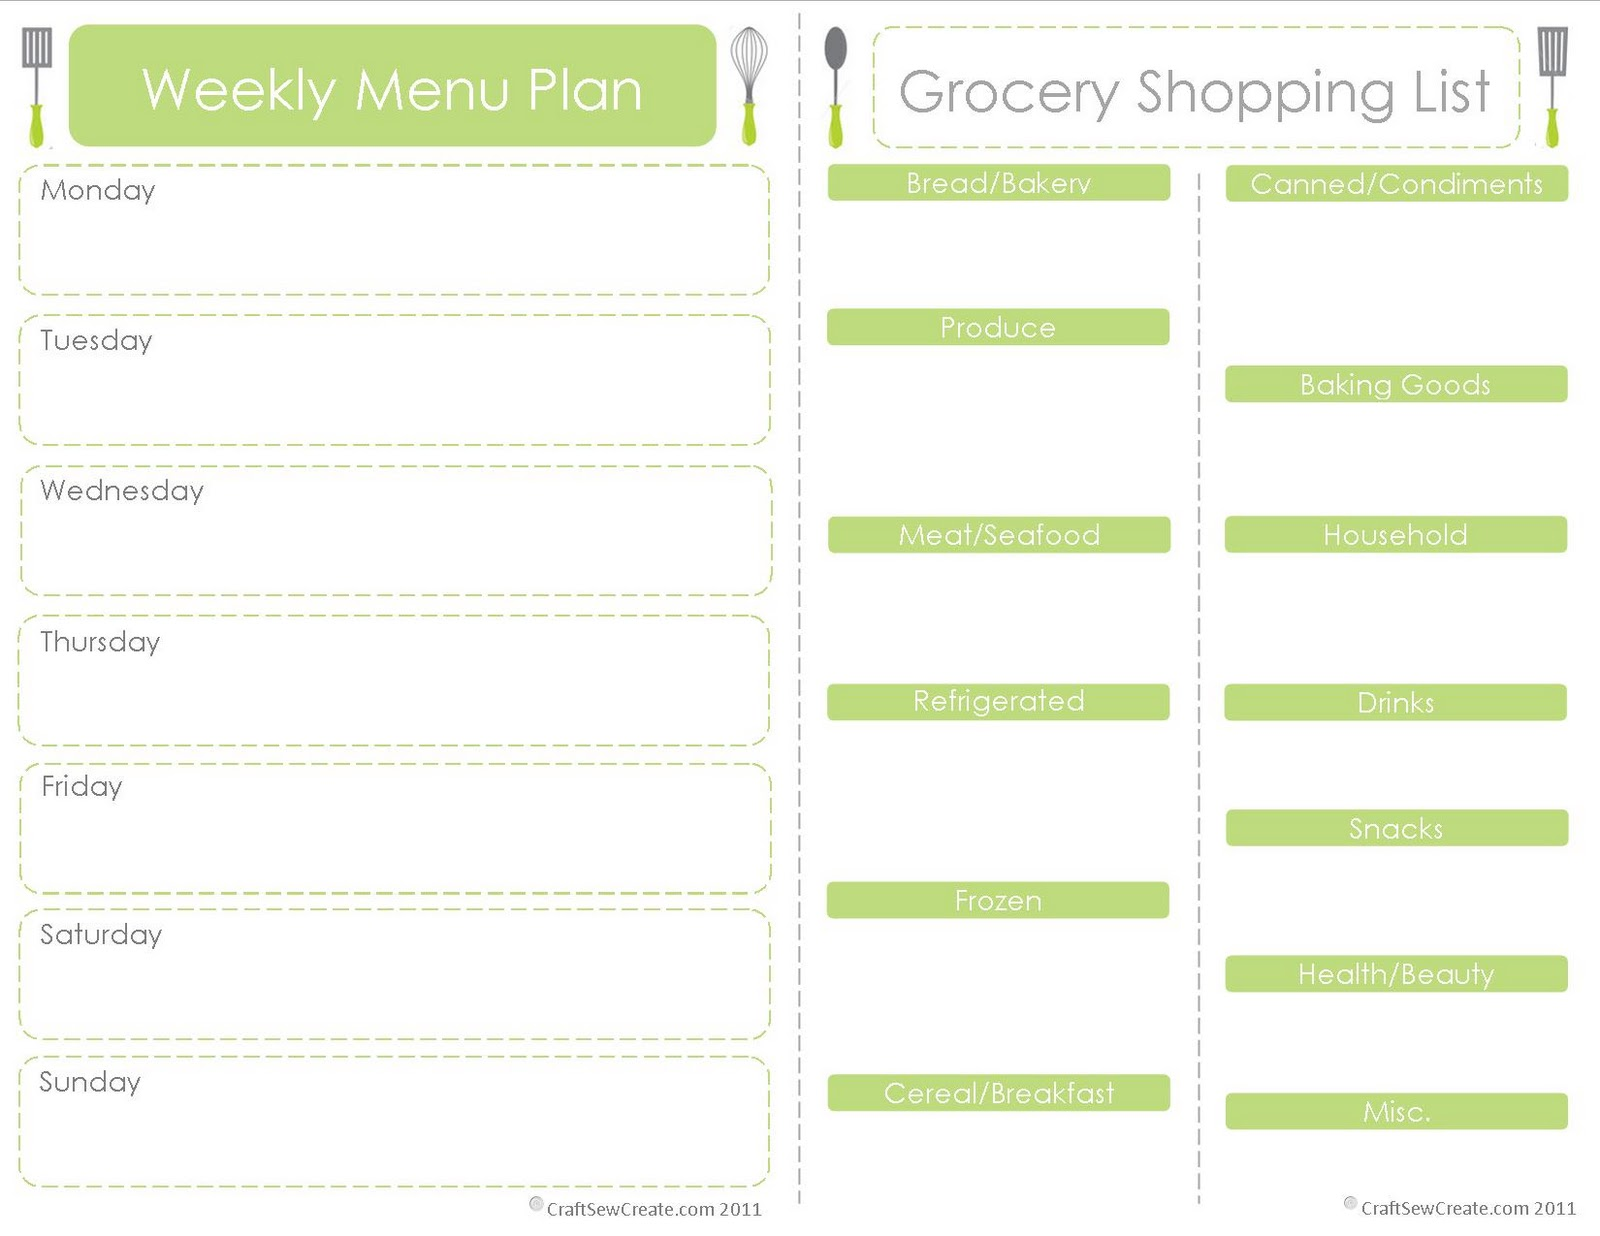 Craft Sew Create: FREE Printable Menu Plan + Shopping List  Craft Sew Creat...